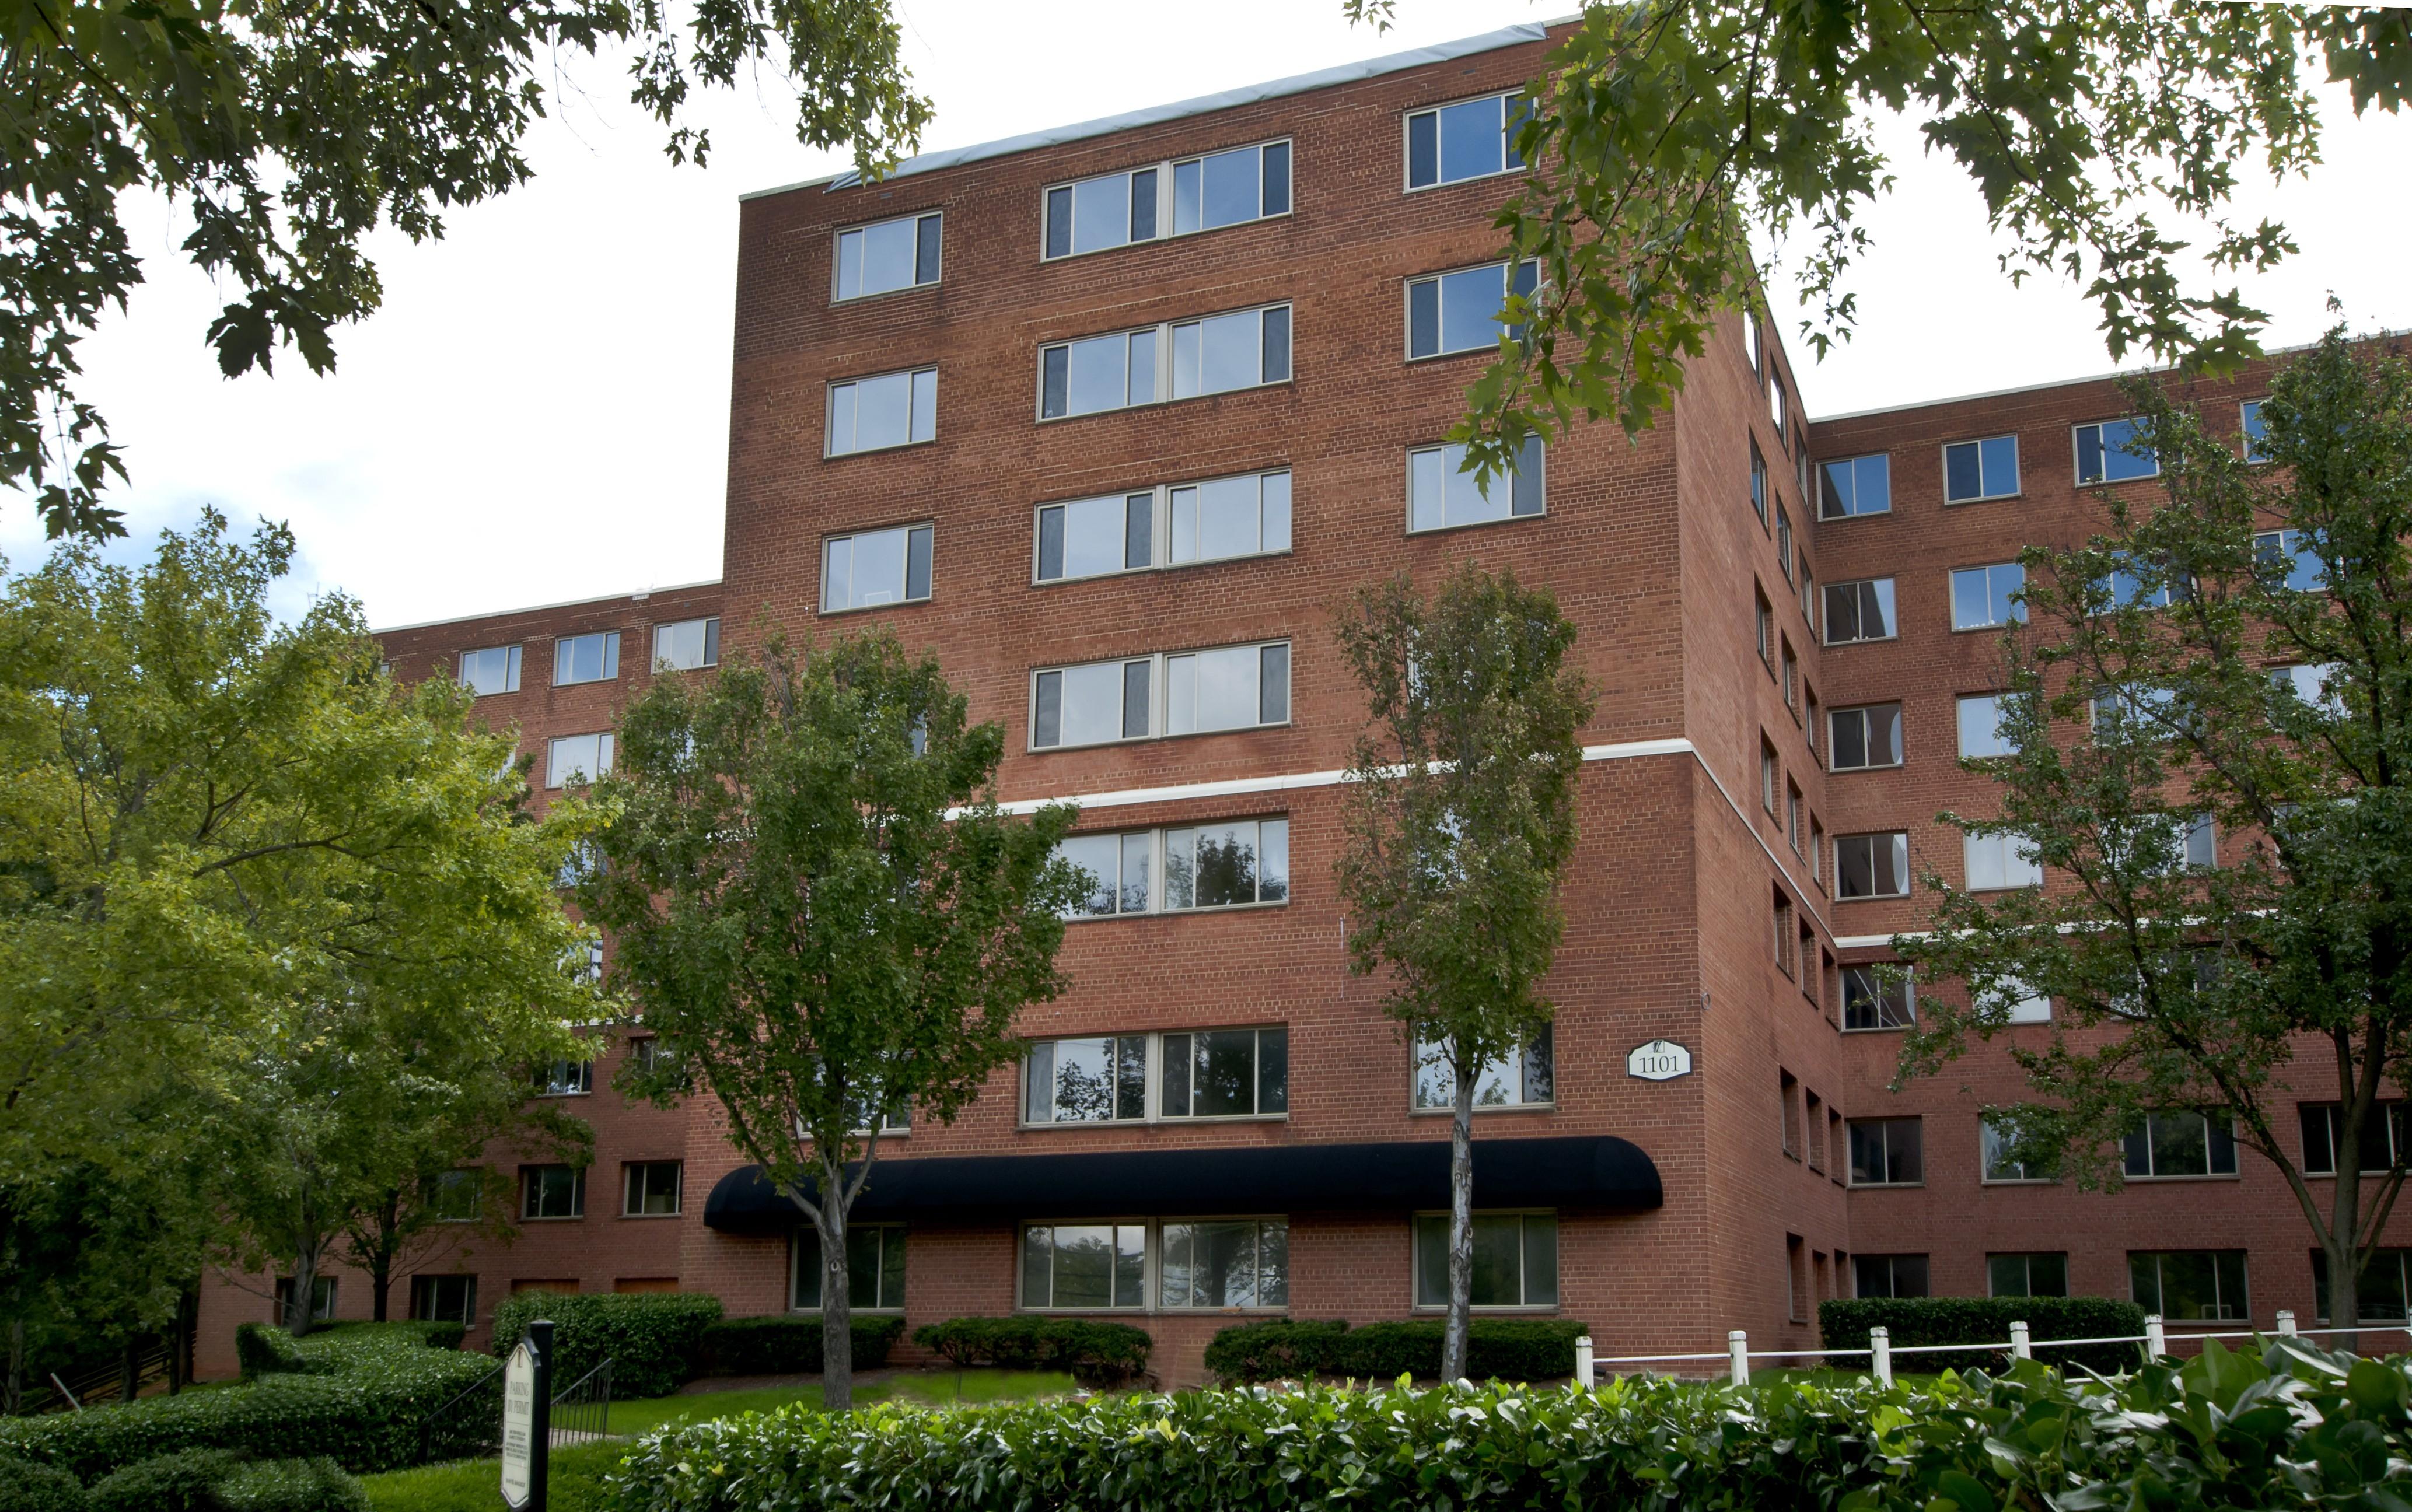 The Milano rental